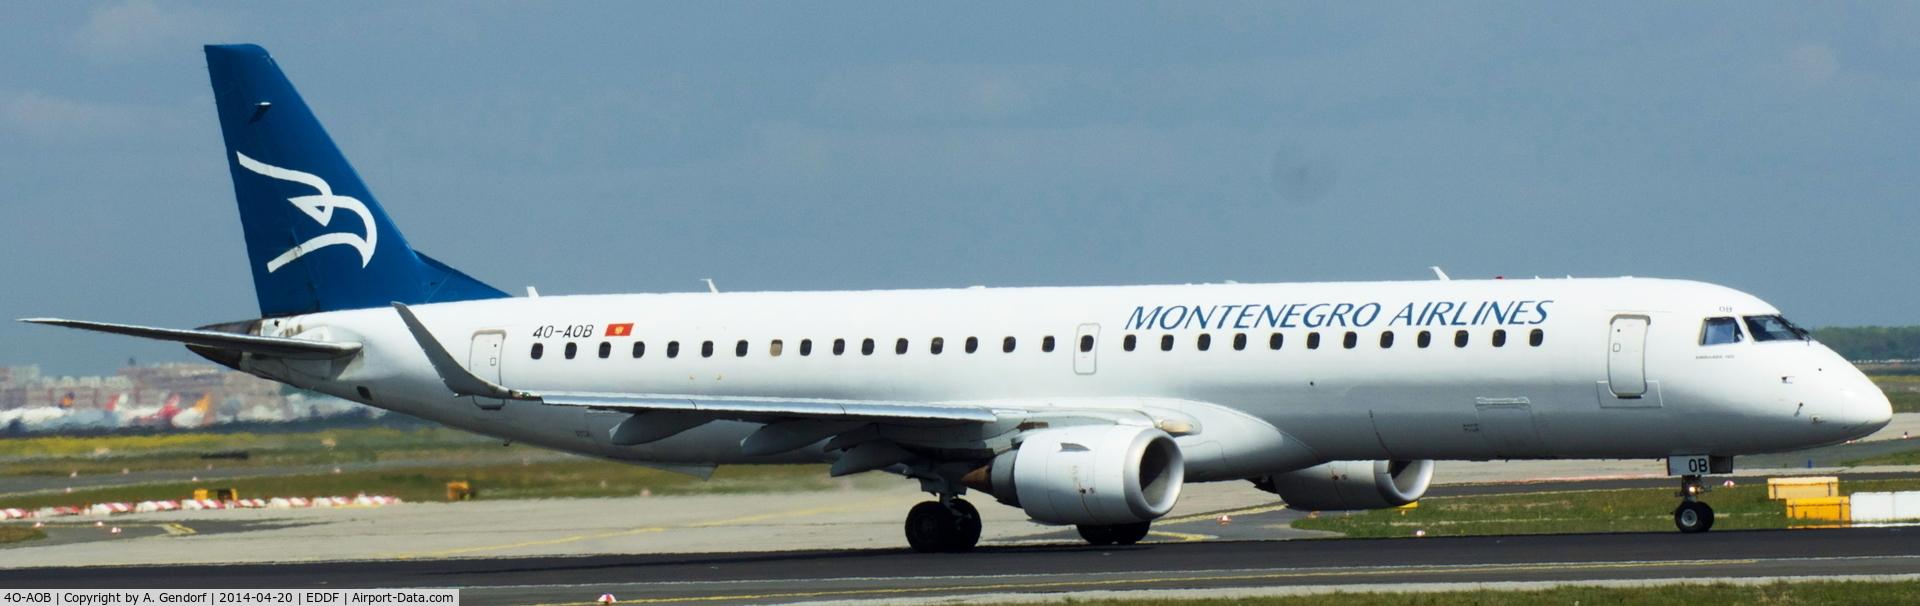 4O-AOB, 2009 Embraer 195LR (ERJ-190-200LR) C/N 19000283, Montenegro Airlines, is here lining up RWY 18 at Frankfurt Rhein/Main Int'l(EDDF)